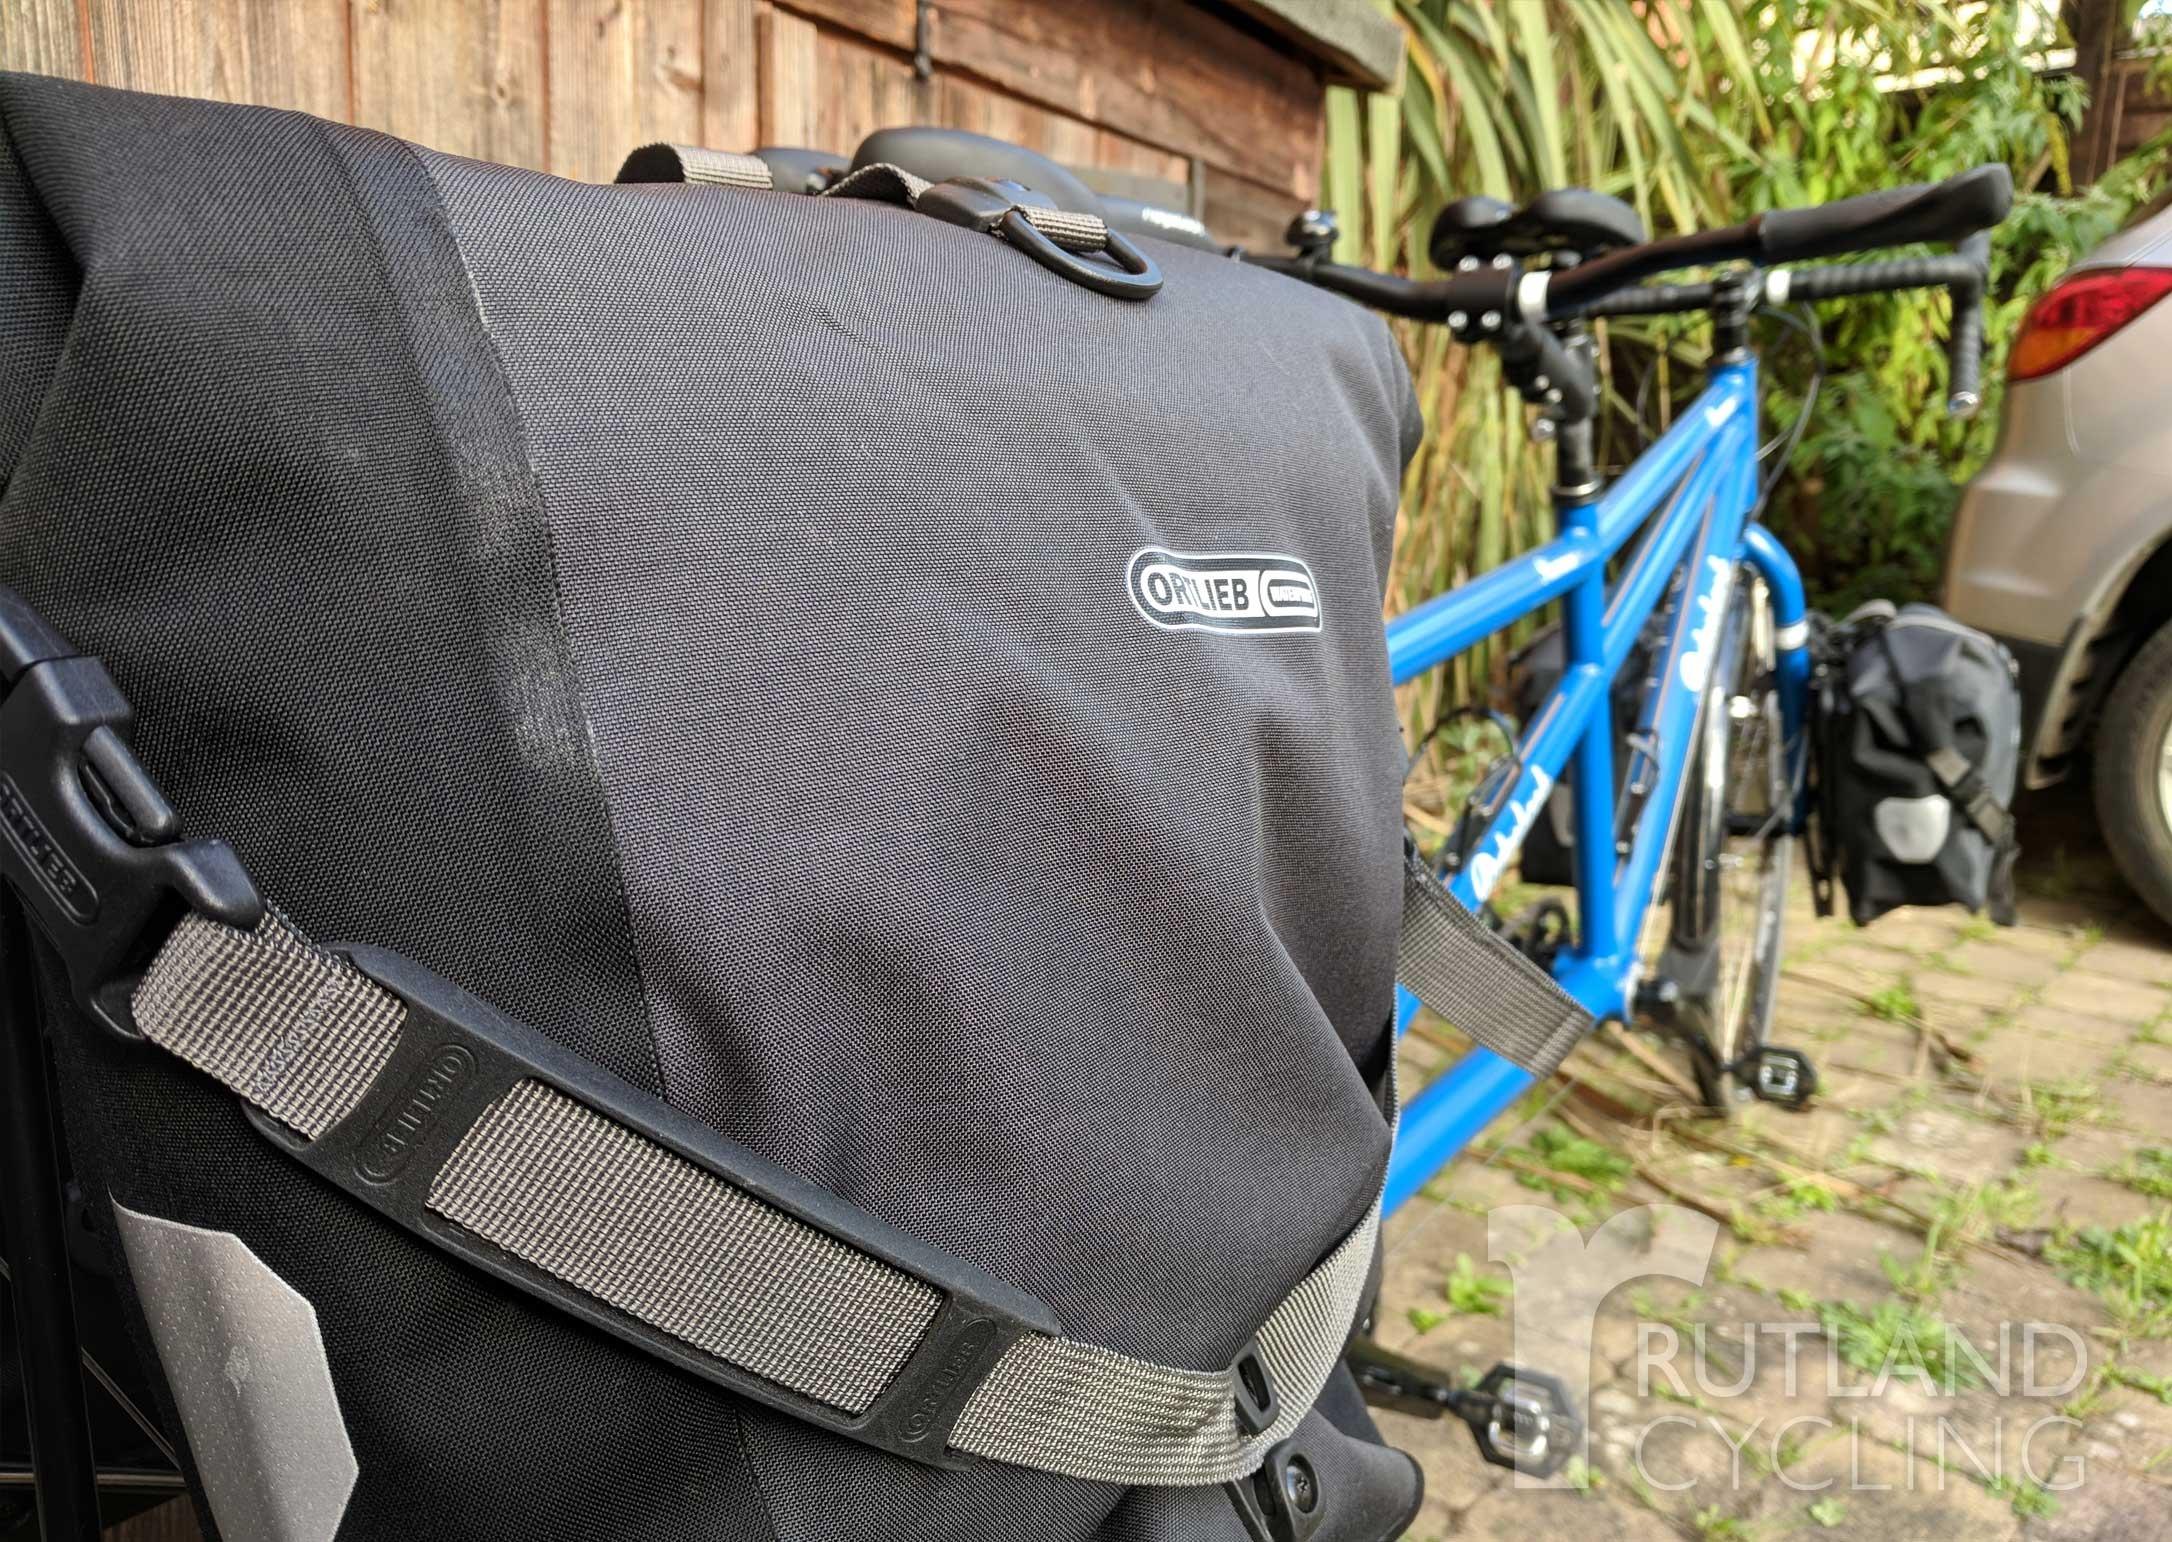 ortlieb-pannier-bike-luggage-back-roller-sport-roller-3